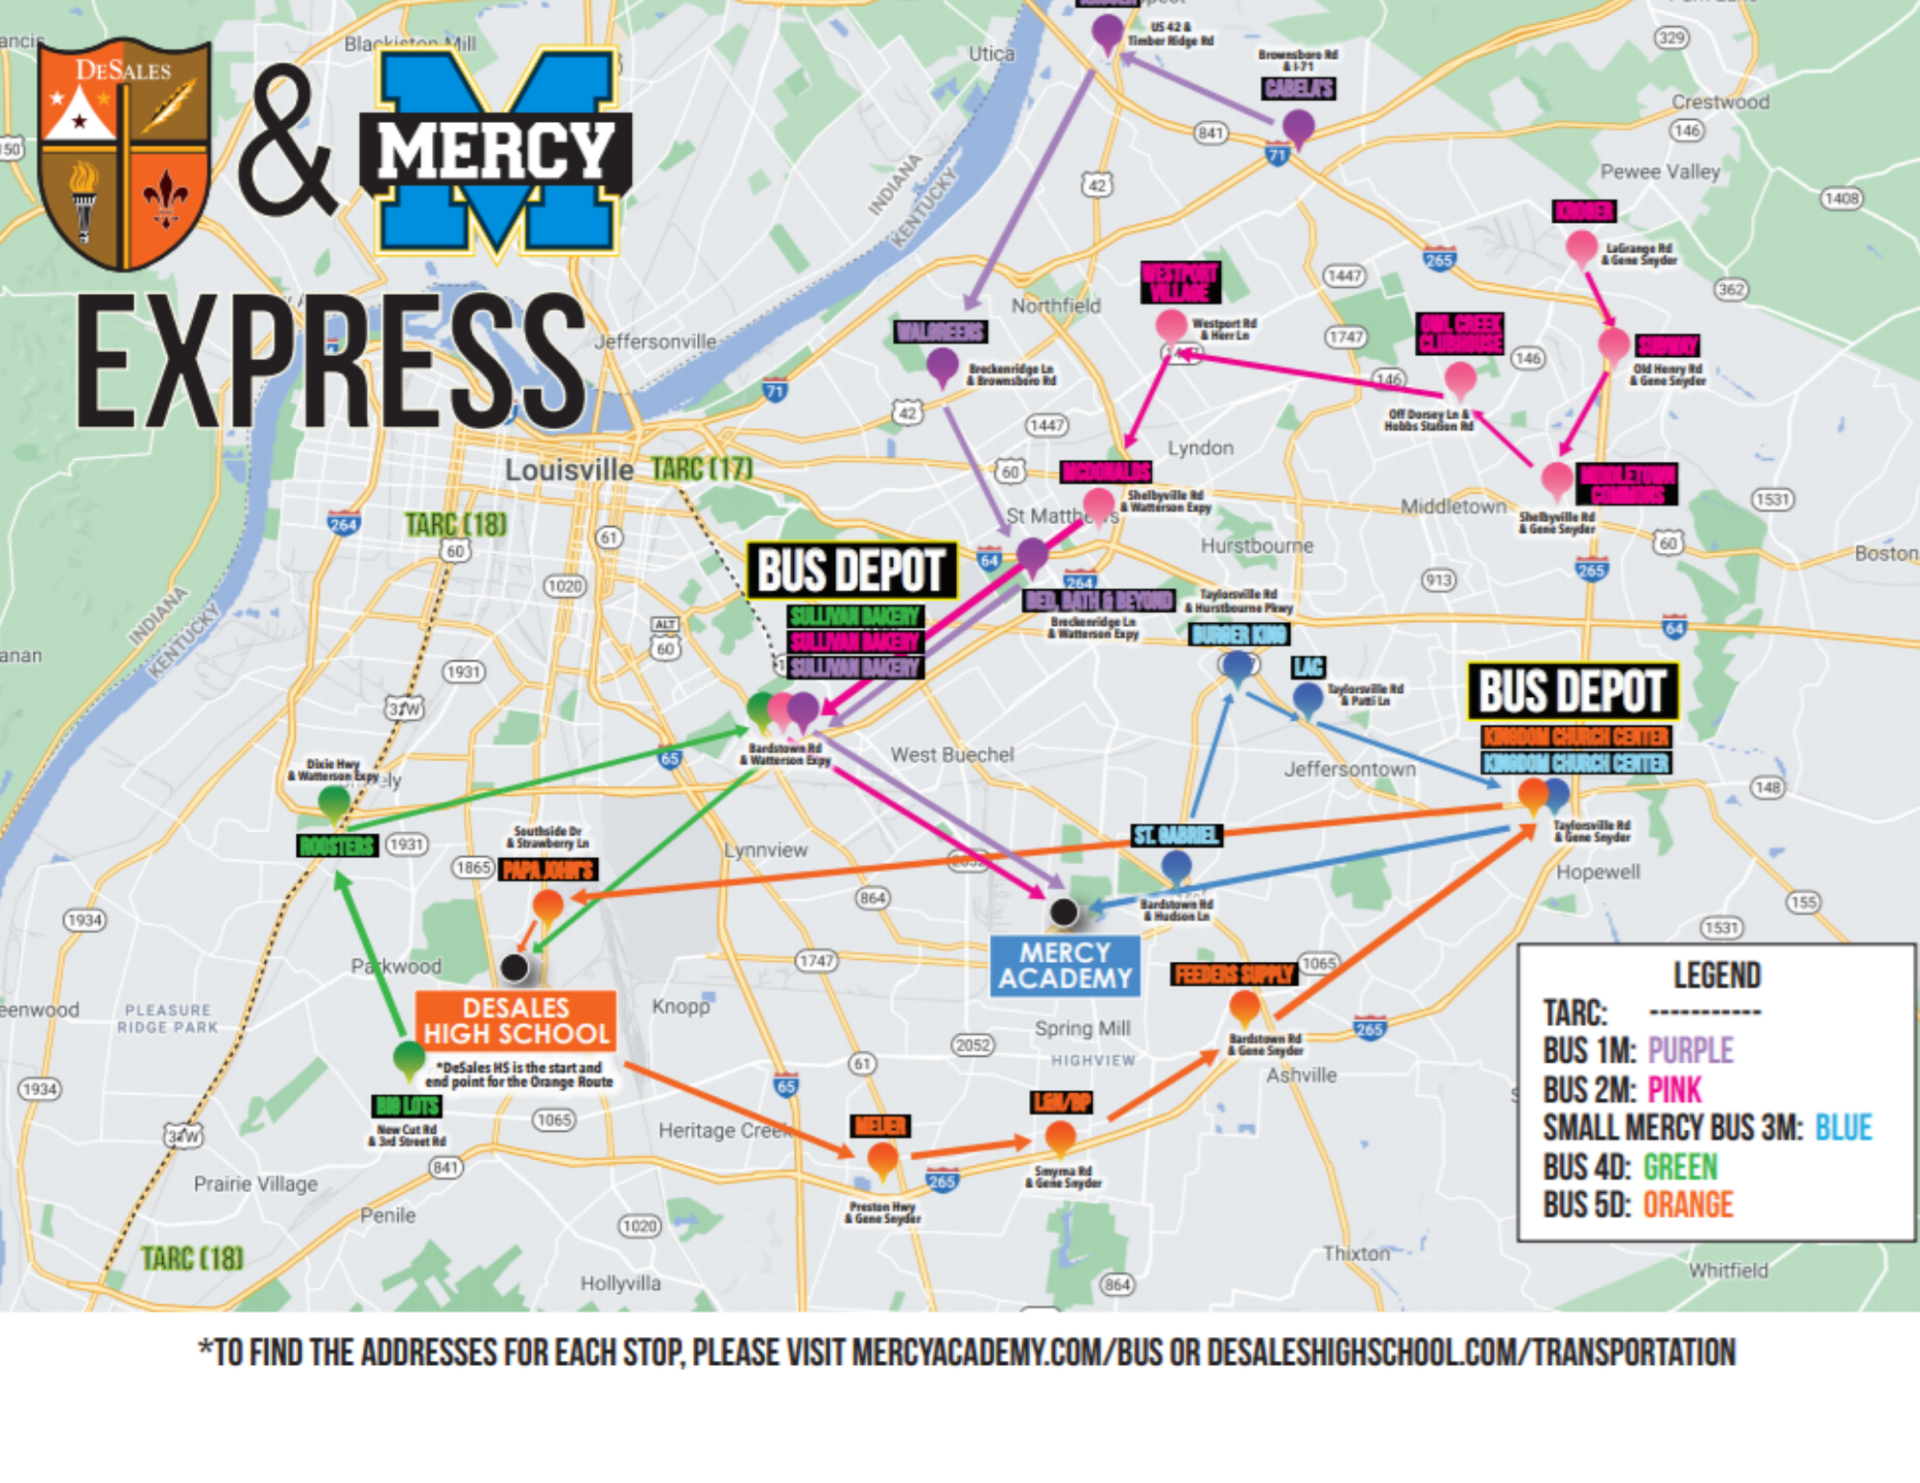 DeSales & Mercy Express